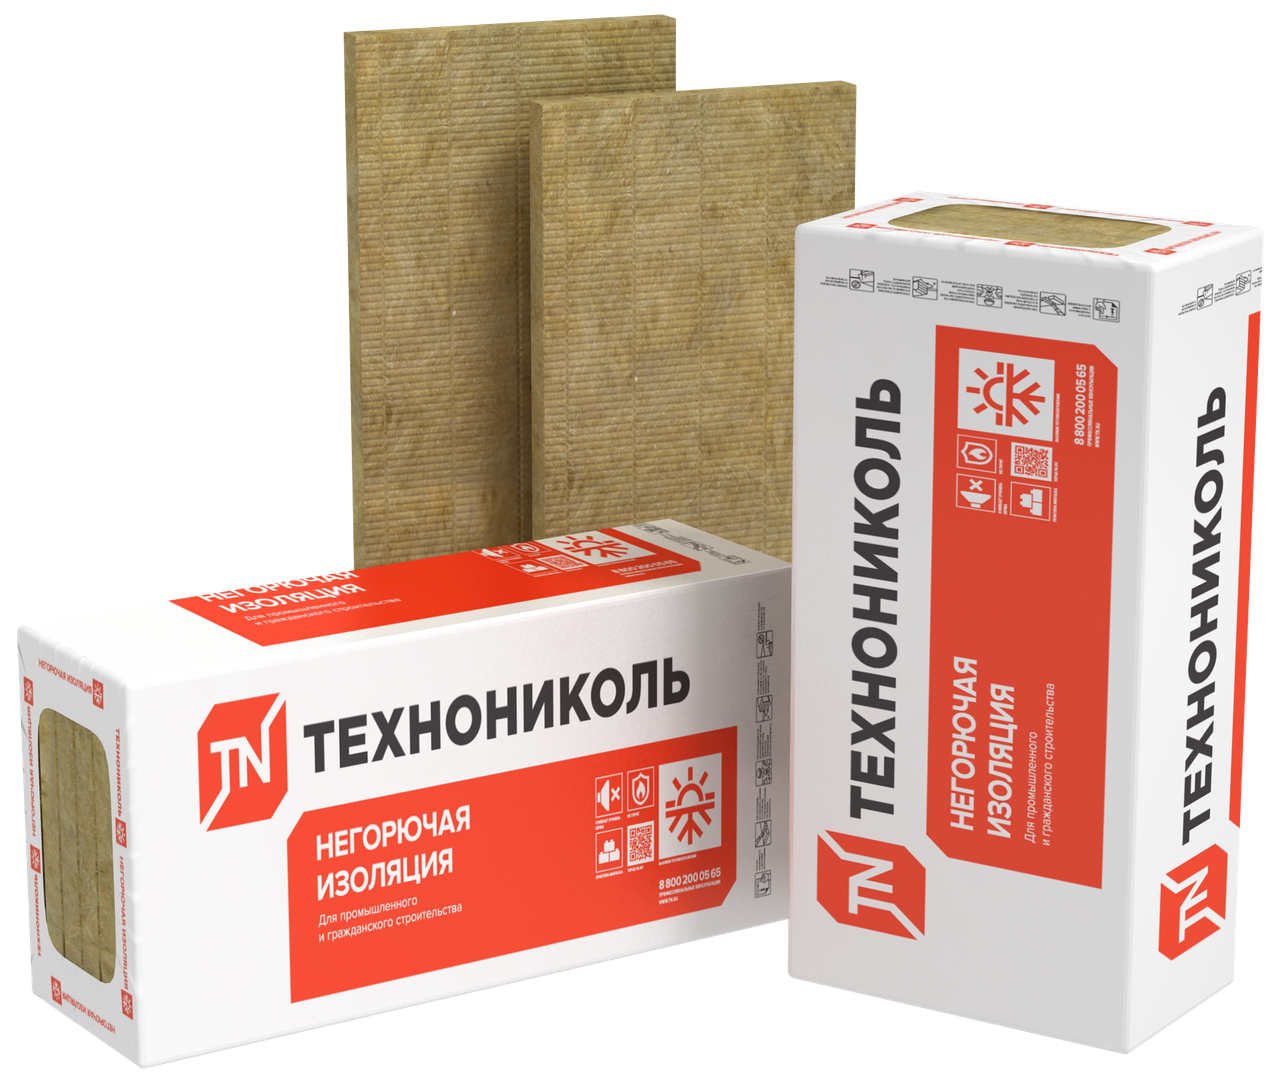 Вата мінеральна Sweetondale Техноруф Н Екстра, 100 кг/куб.м 130 мм